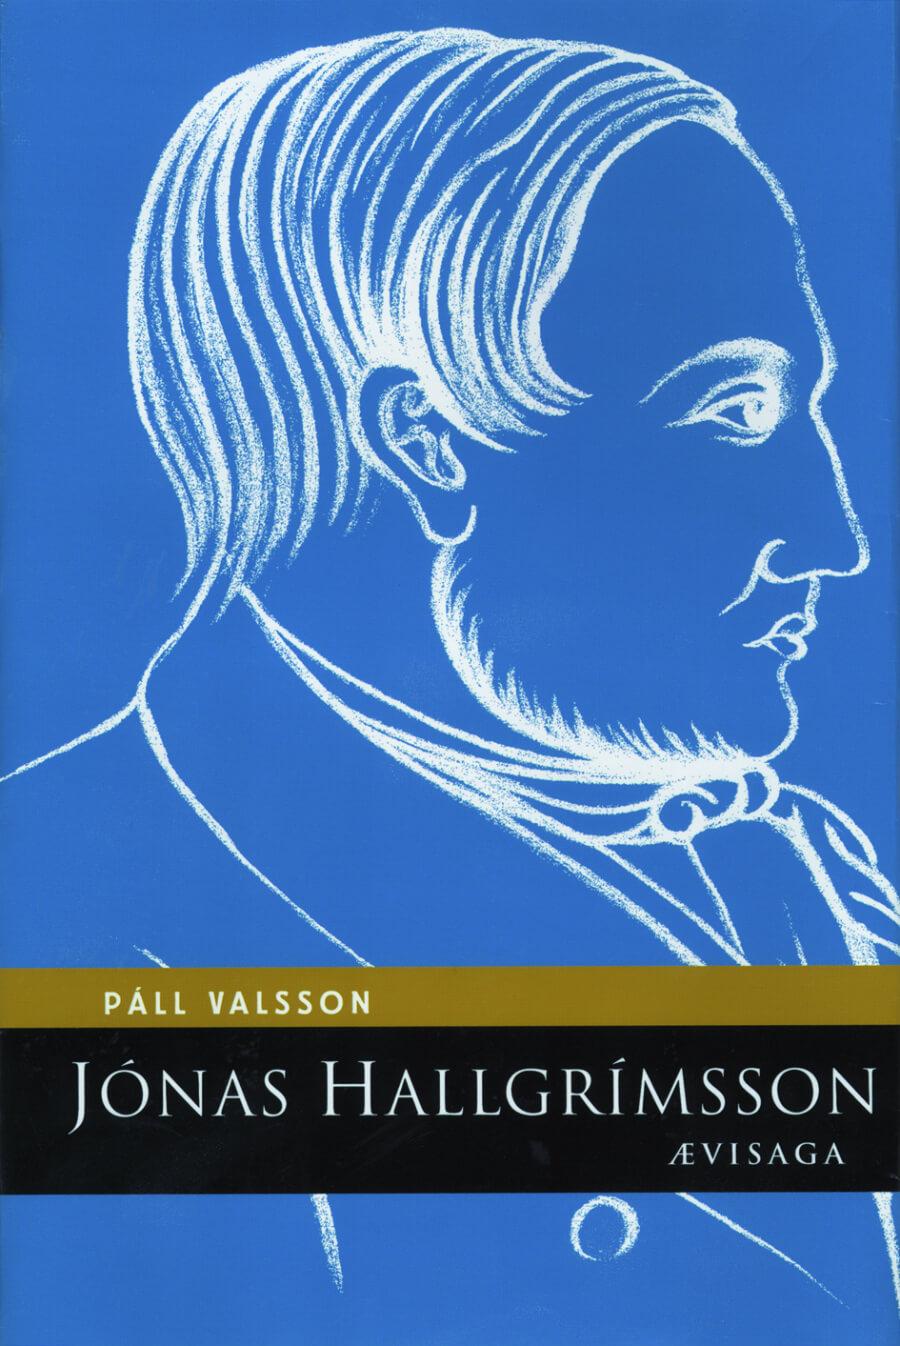 Jónas Hallgrímsson – Ævisaga